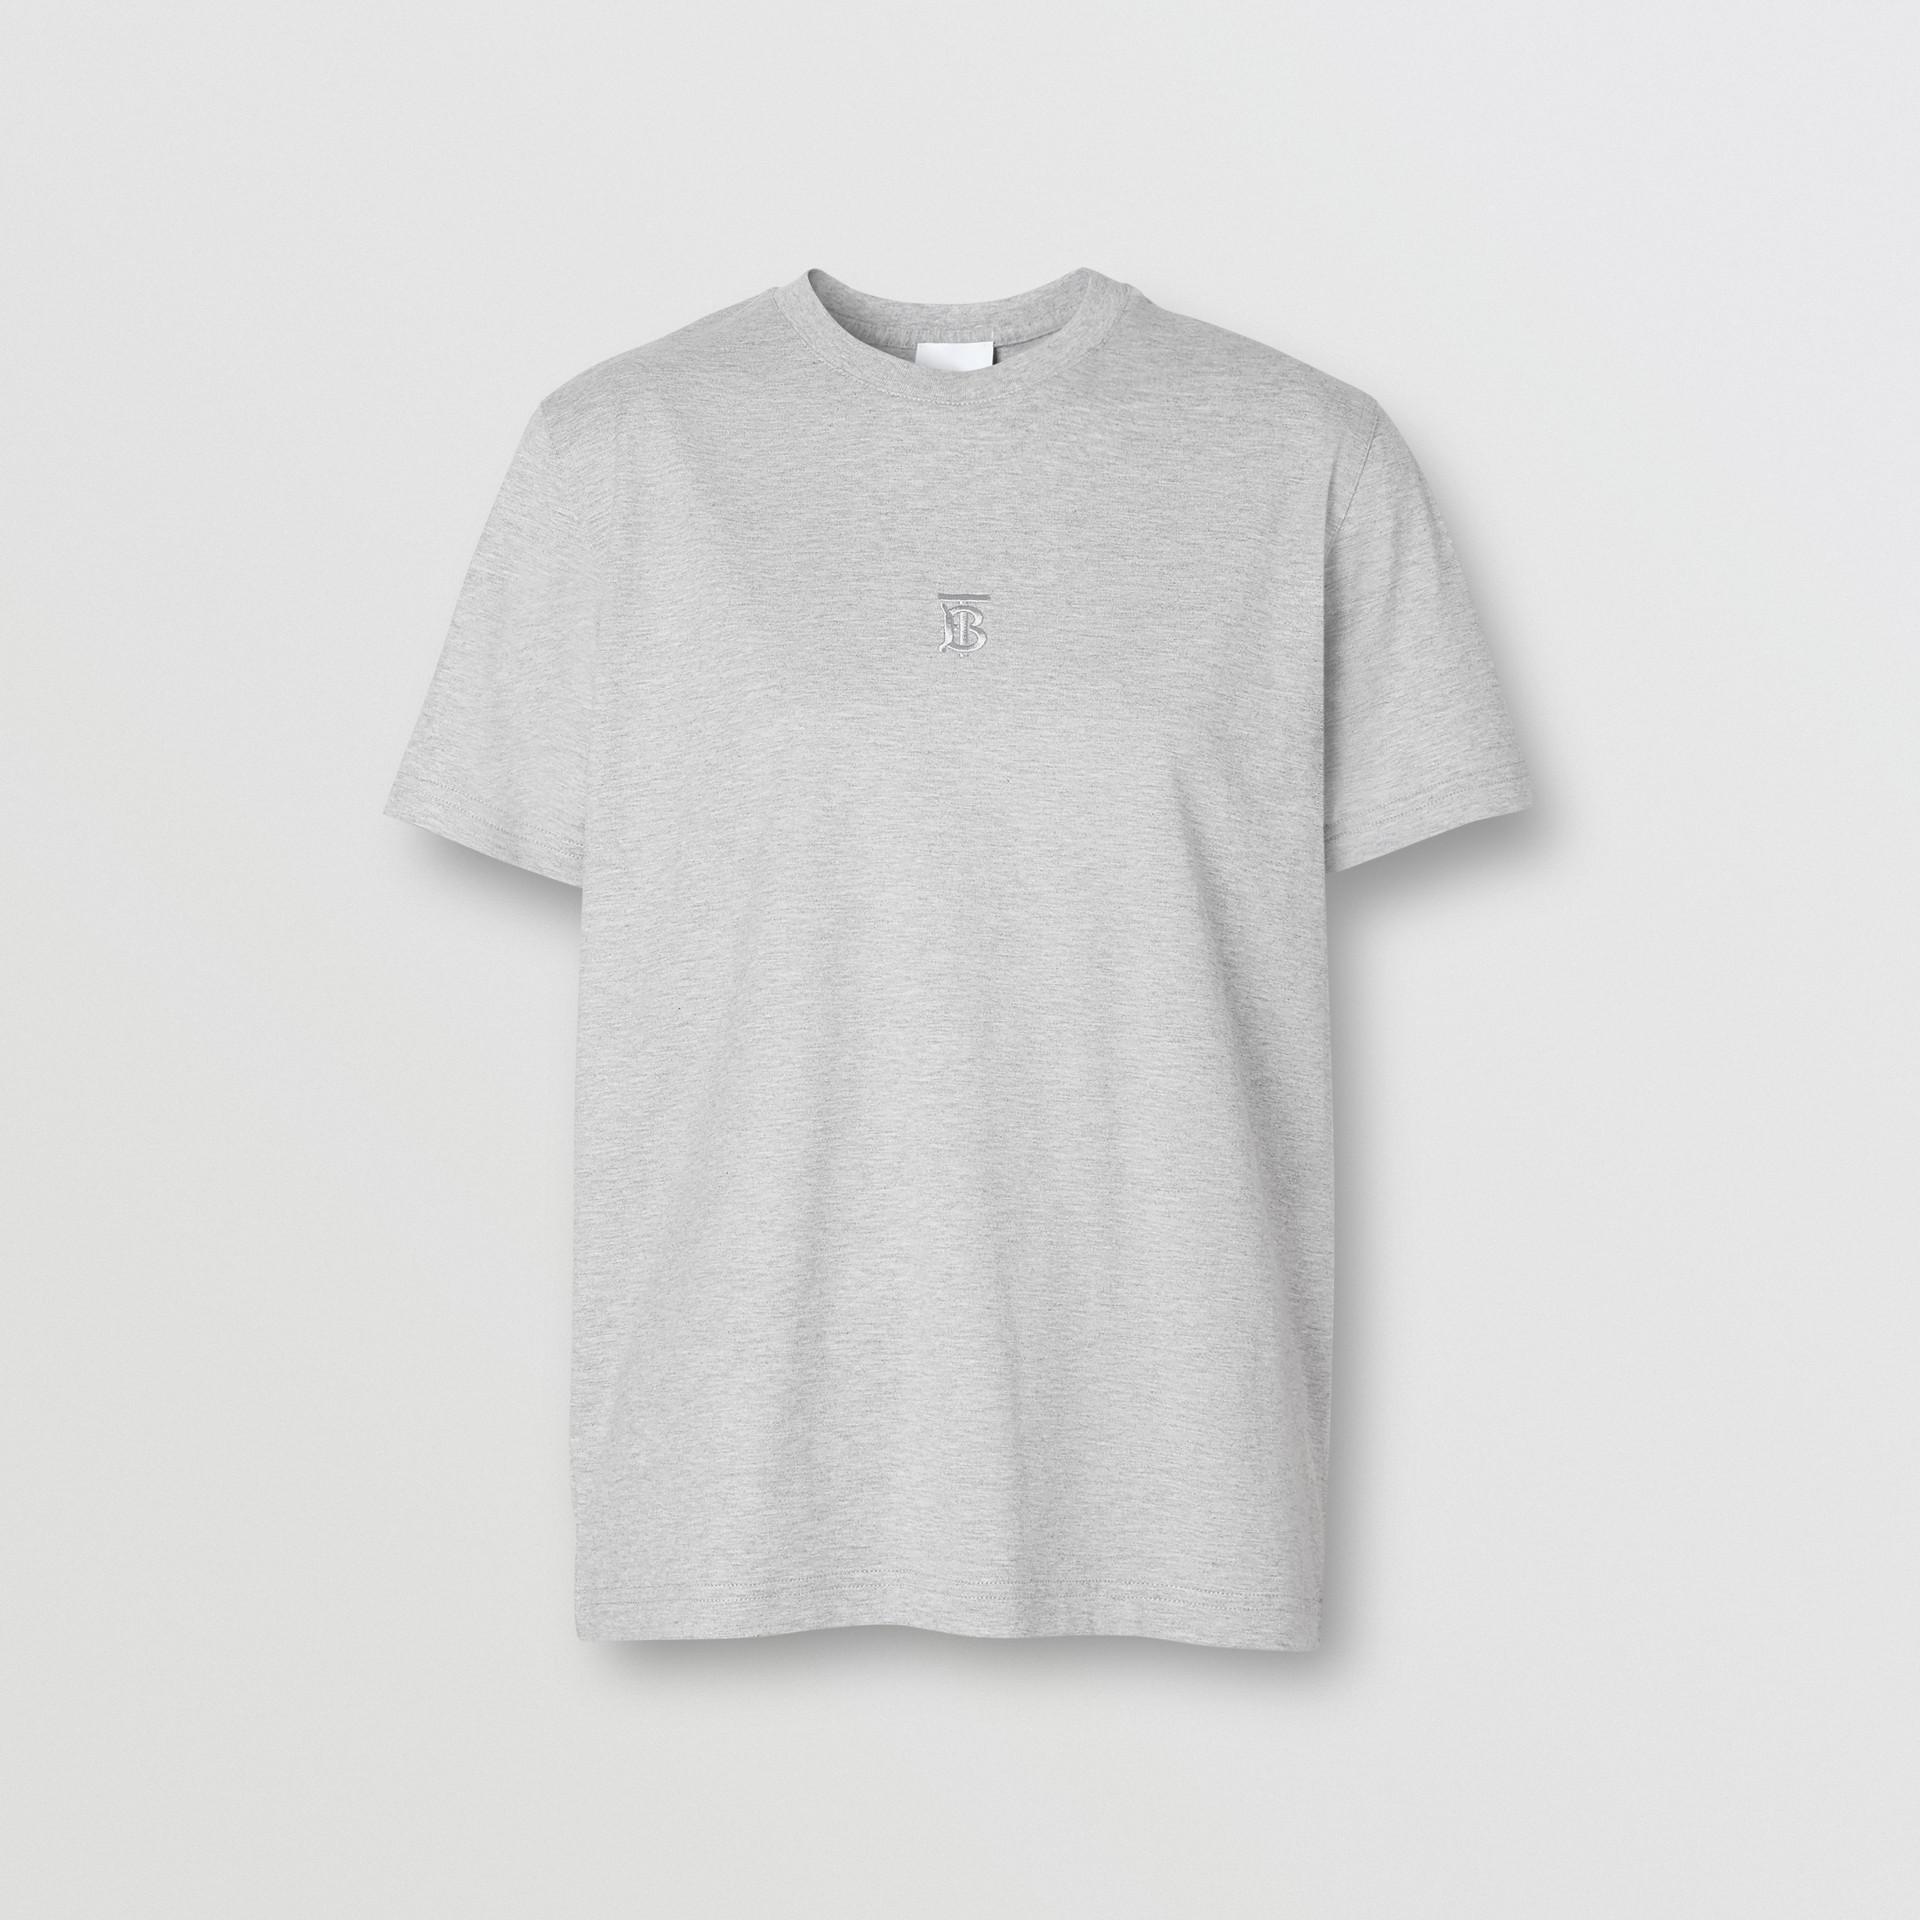 Monogram Motif Cotton T-shirt in Pale Grey Melange - Women | Burberry - gallery image 3